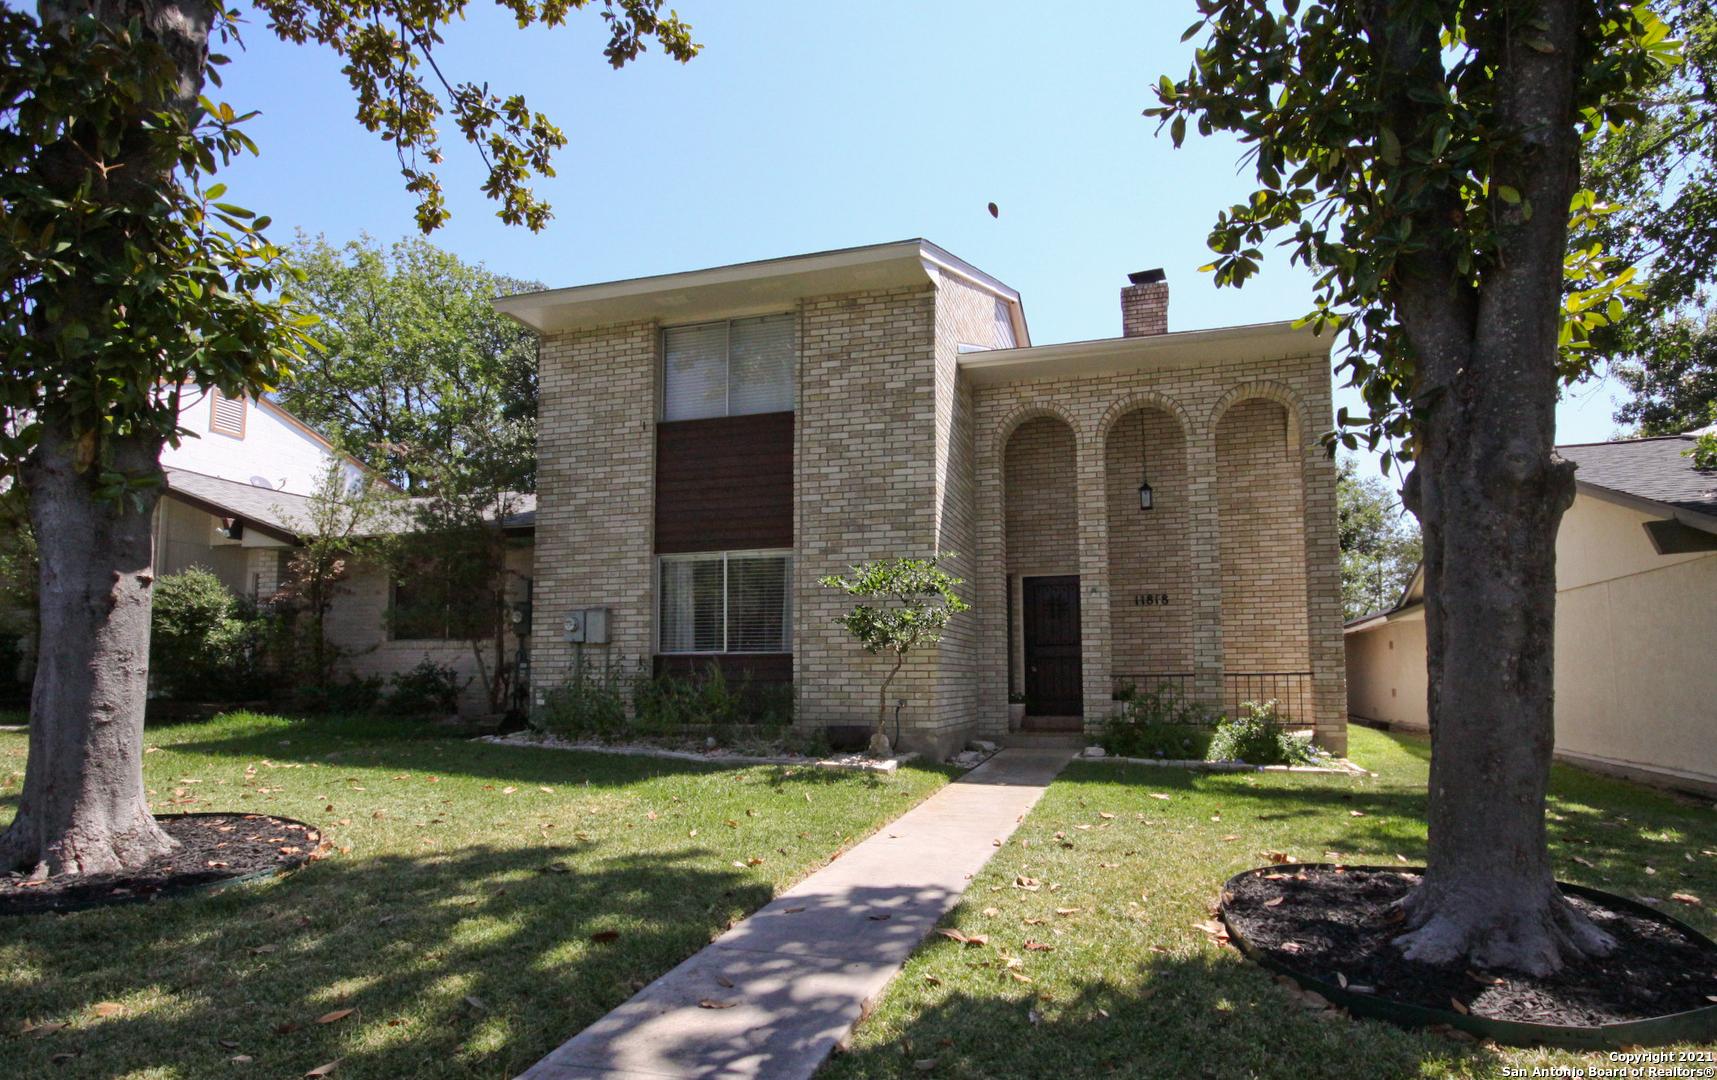 11818 APPLE BLOSSOM ST, San Antonio, TX 78247